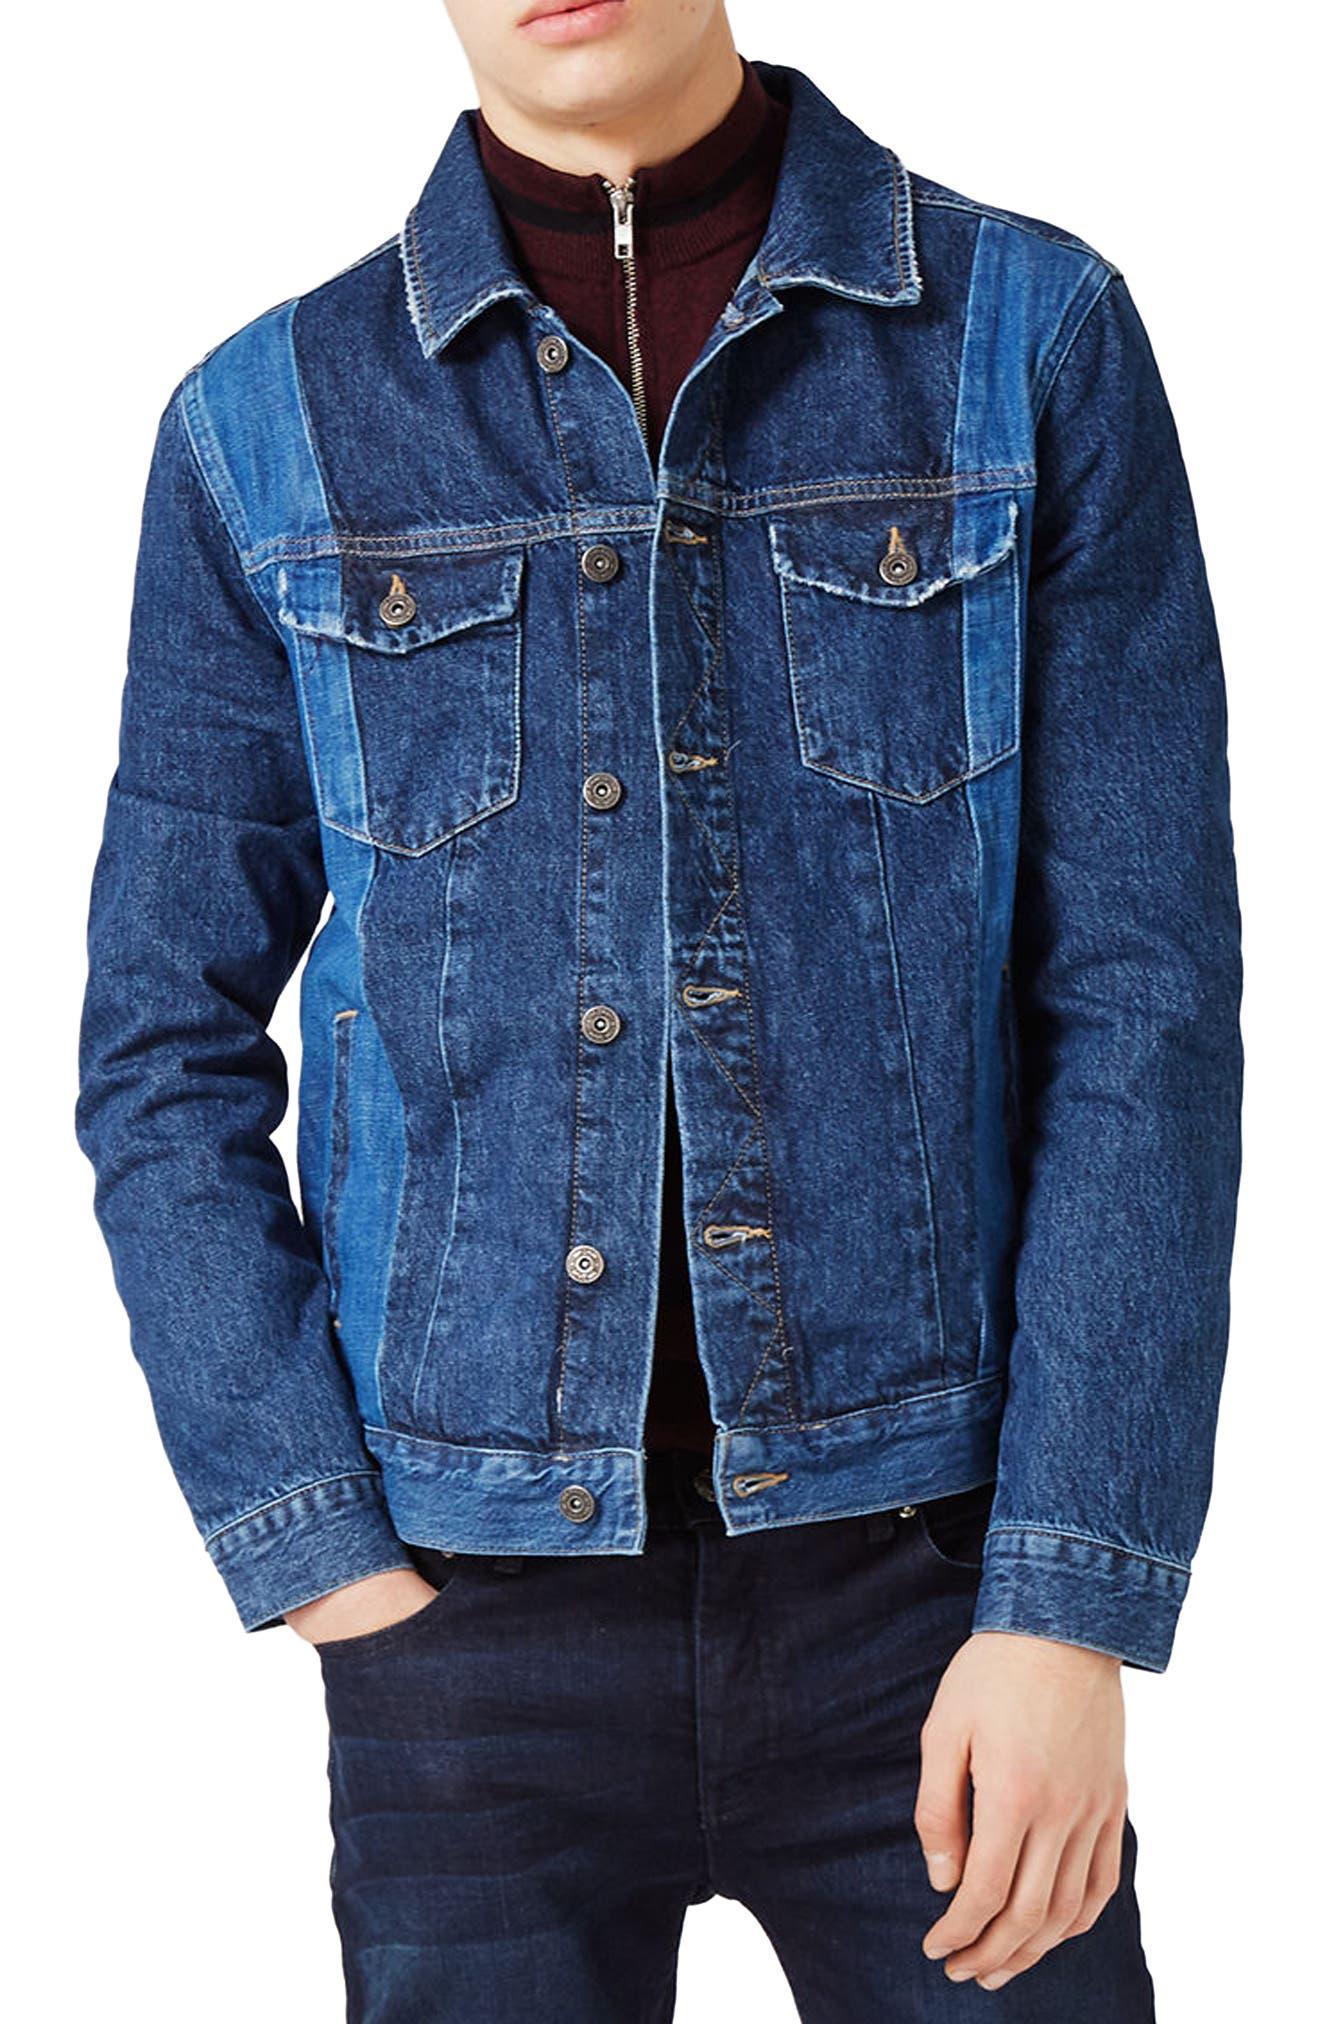 TOPMAN Two-Tone Denim Jacket